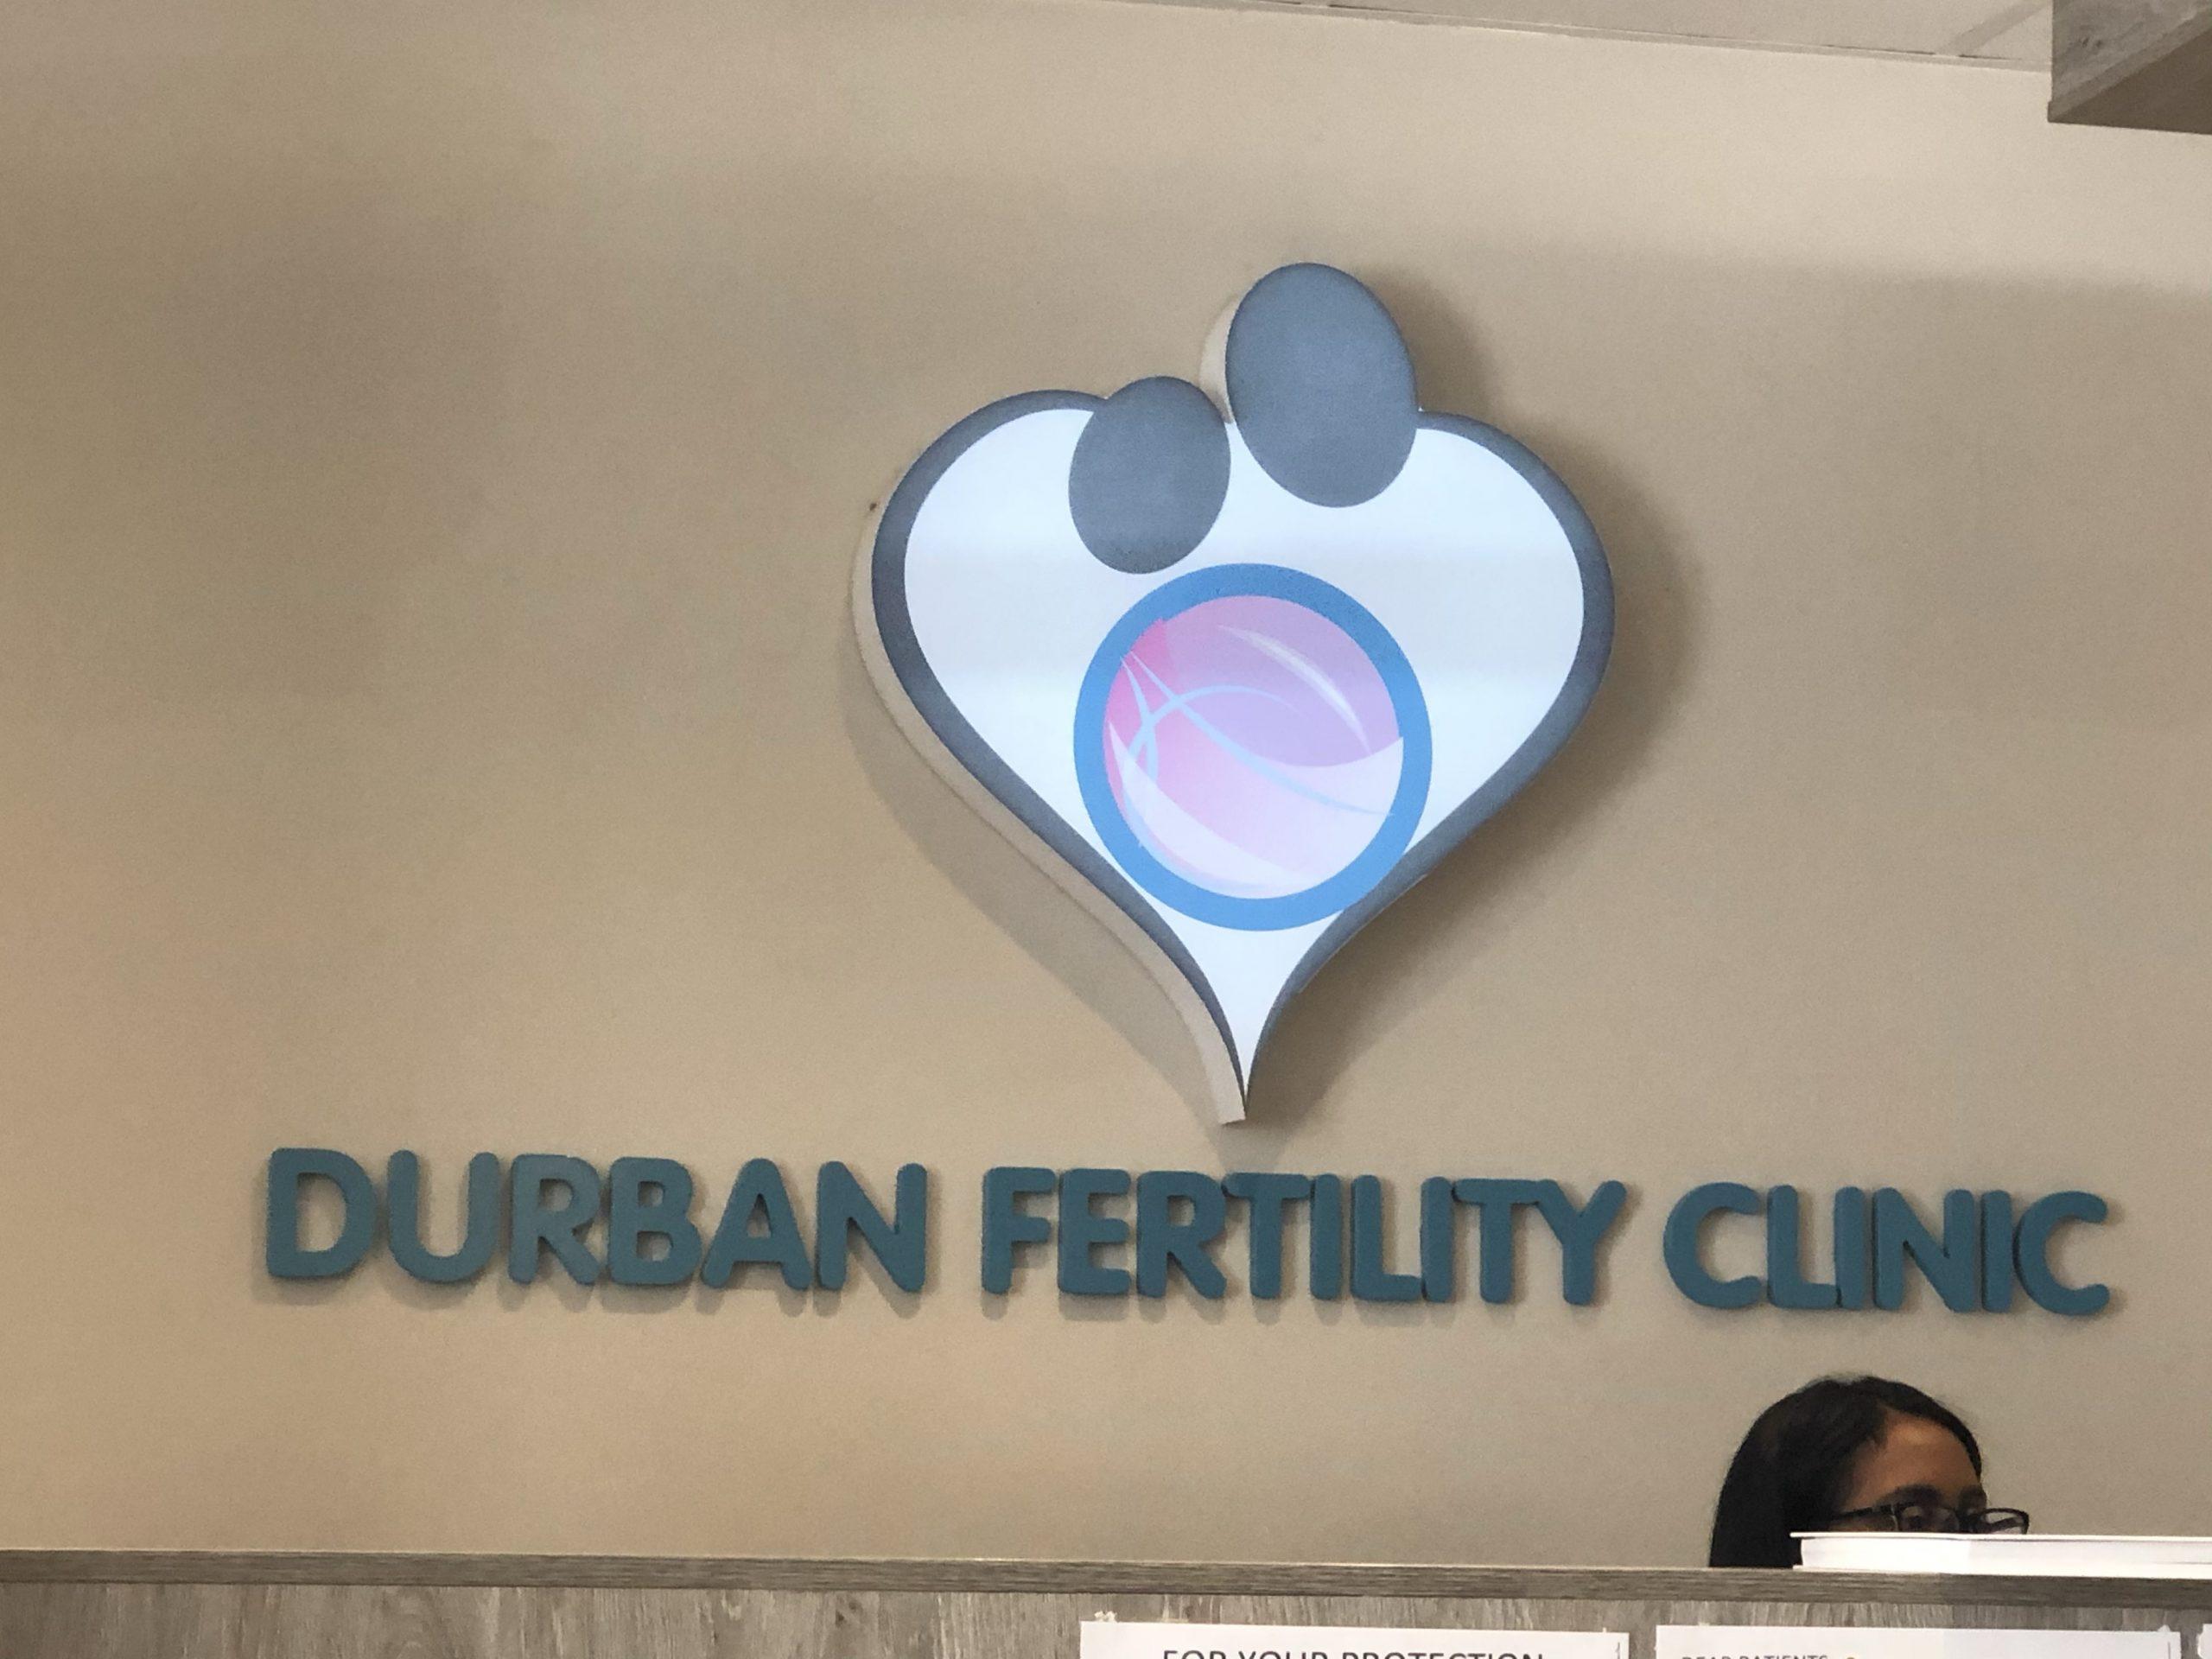 Egg donor clinics